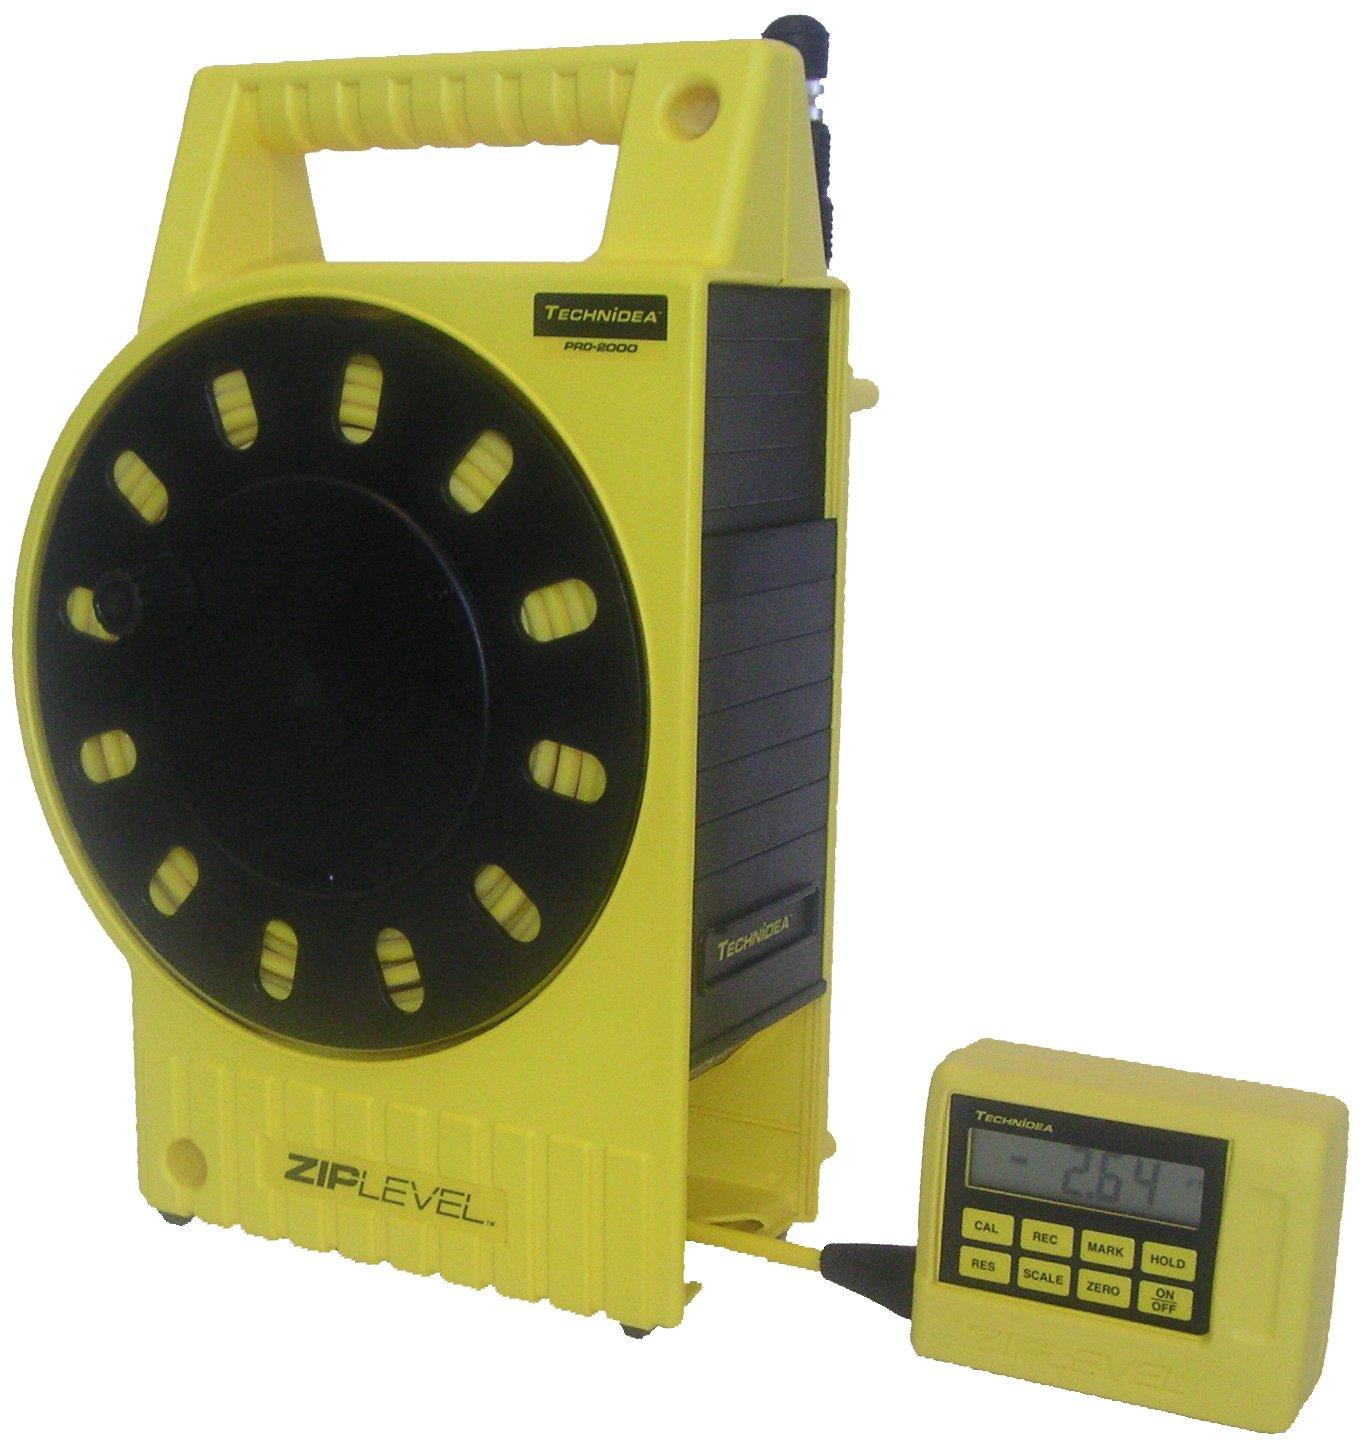 ZIPLEVEL PRO-2000 High Precision Altimeter by Technidea Corporation